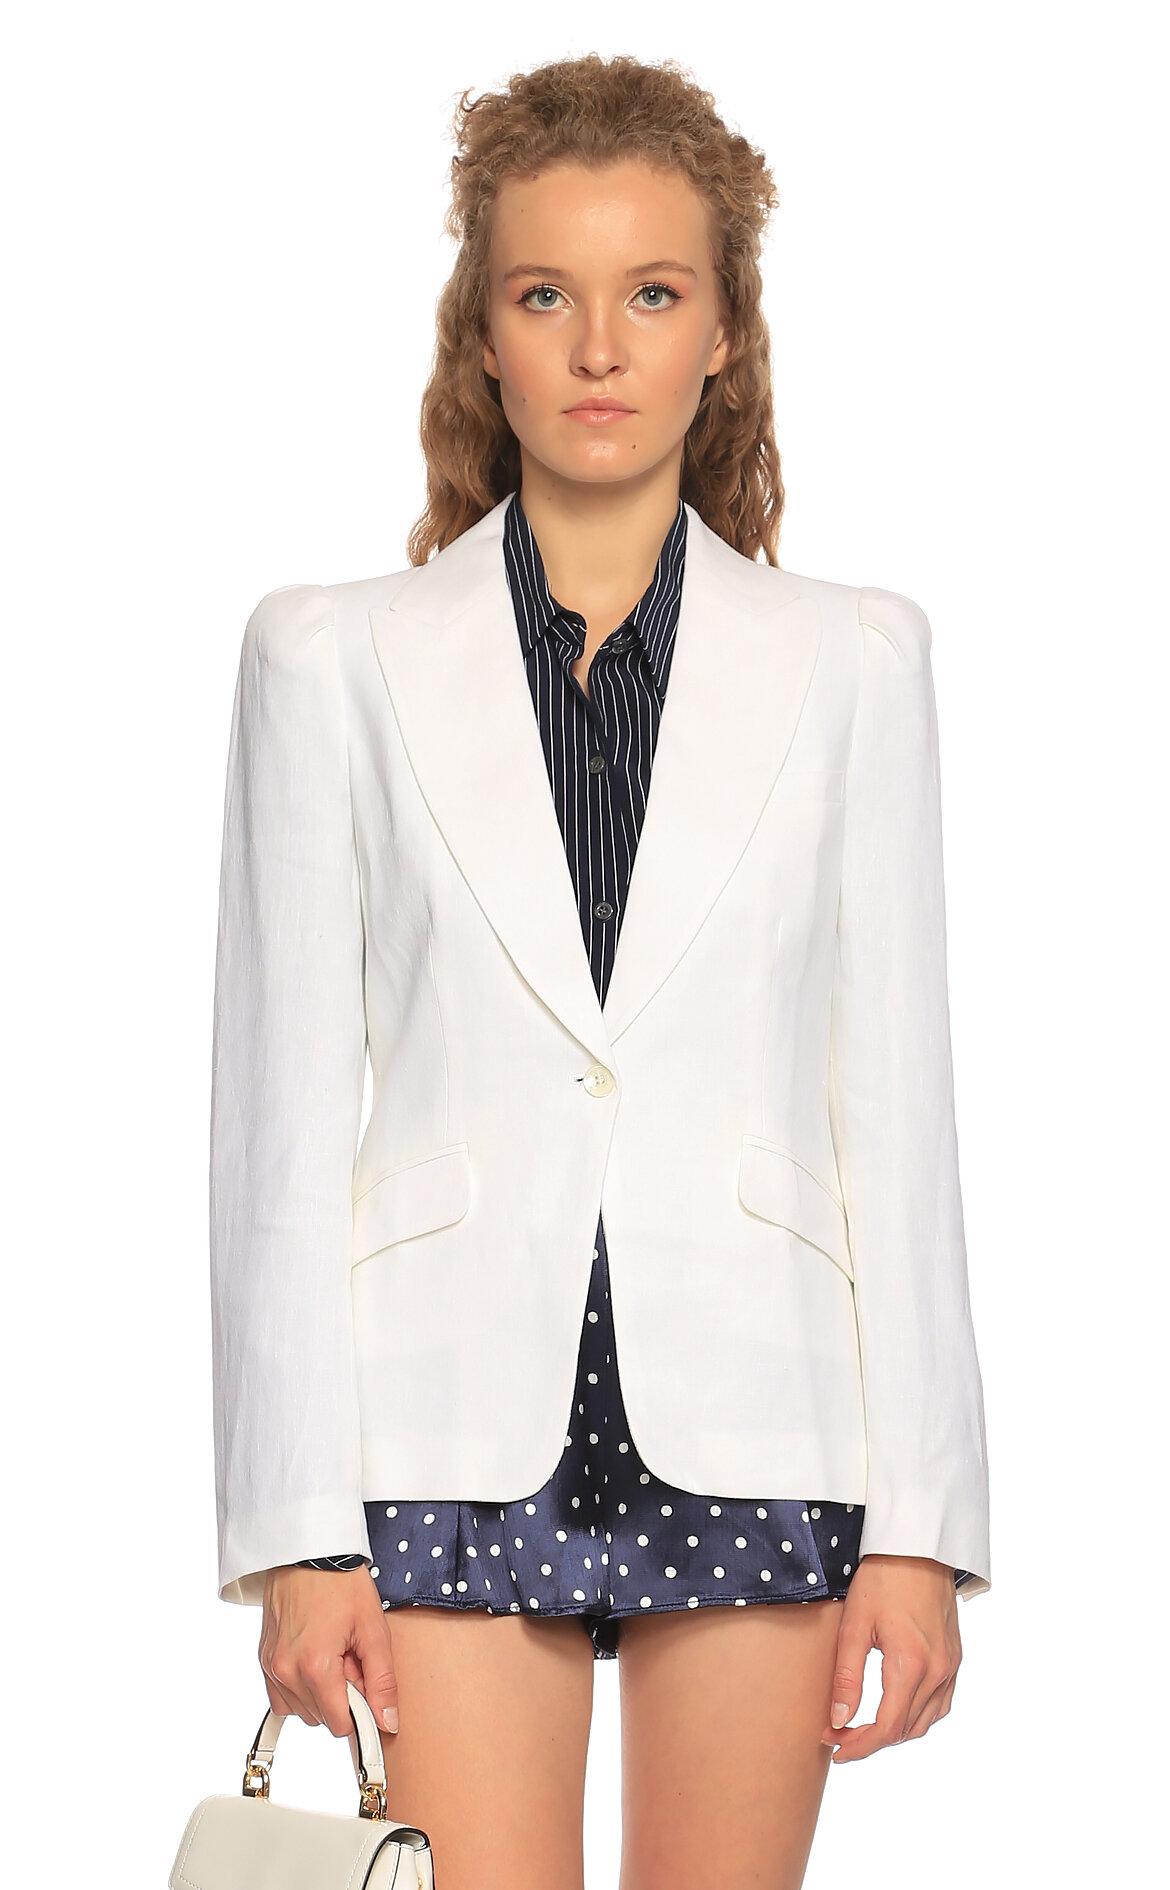 Michael Kors Collection  Beyaz Ceket